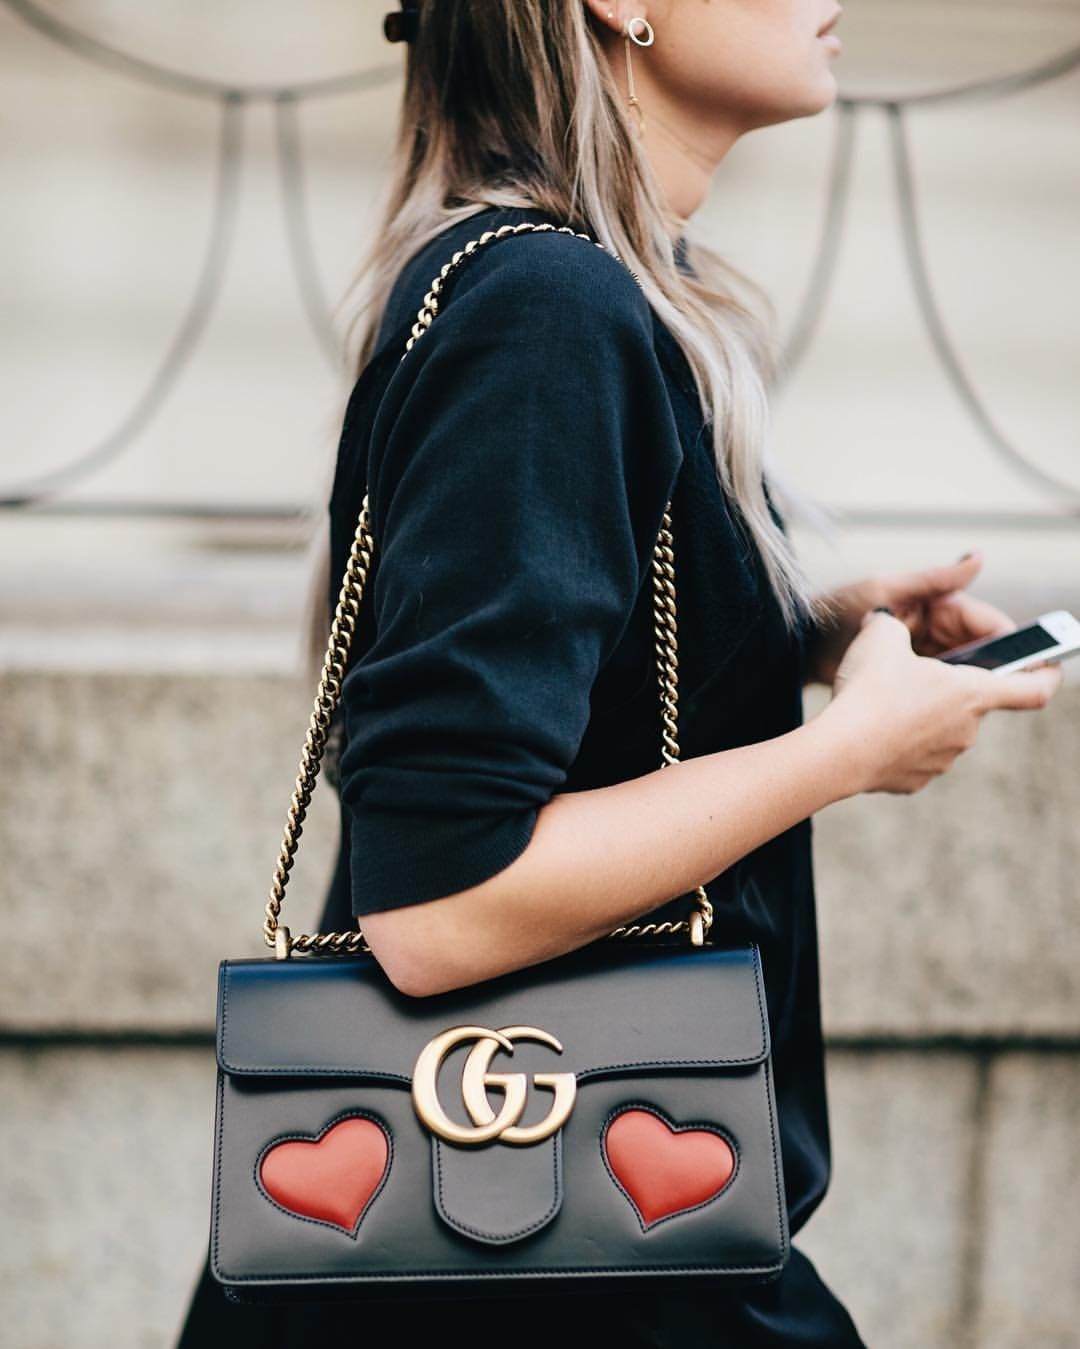 Gucci bag | Crossbody bag | Bucketlist bag | One day | Wannahave | More on Fashionchick